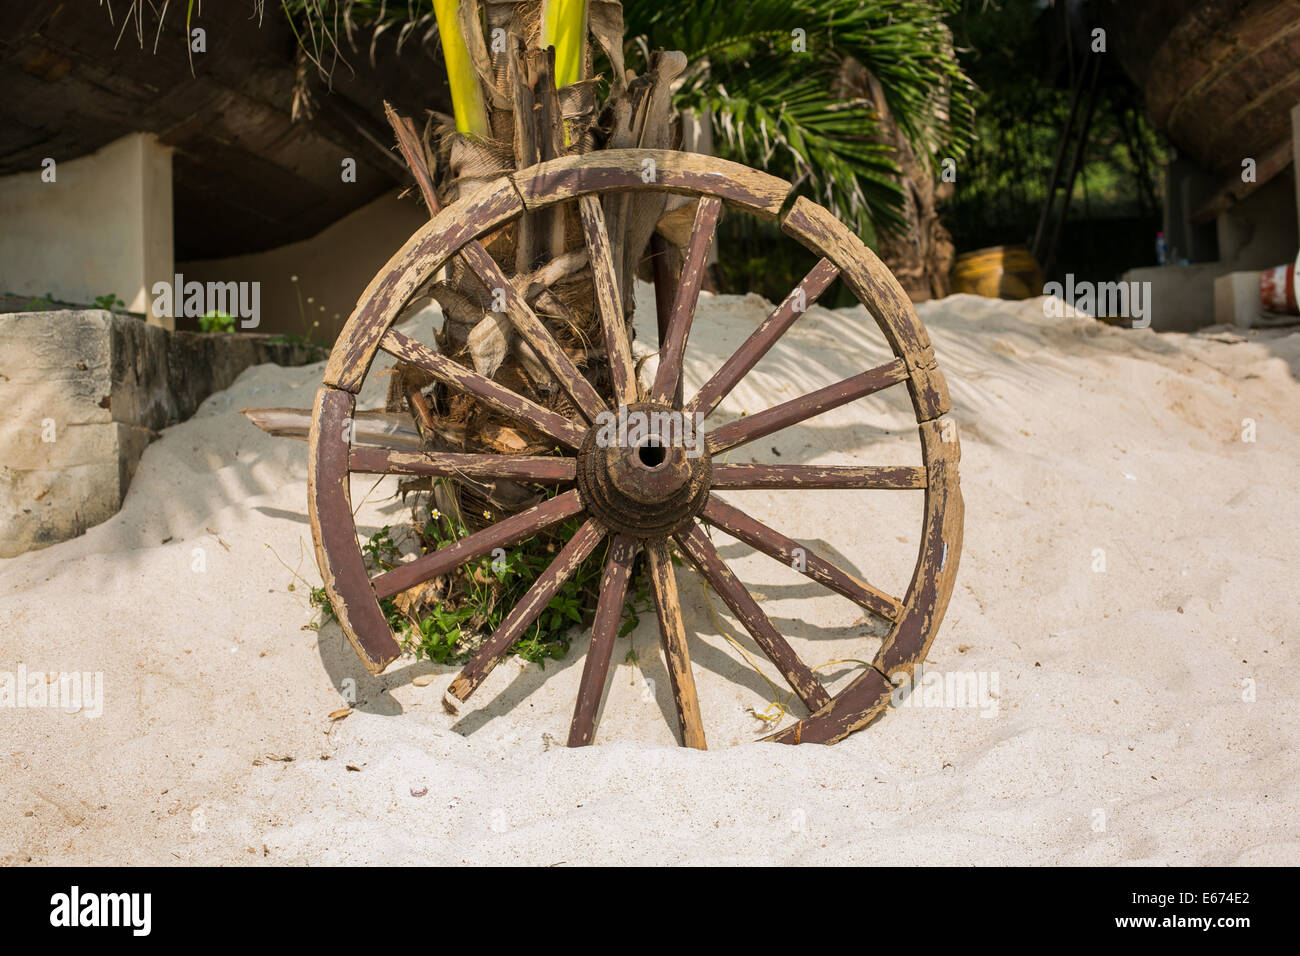 Old brown wooden wheel on sand beach.Stock Photo